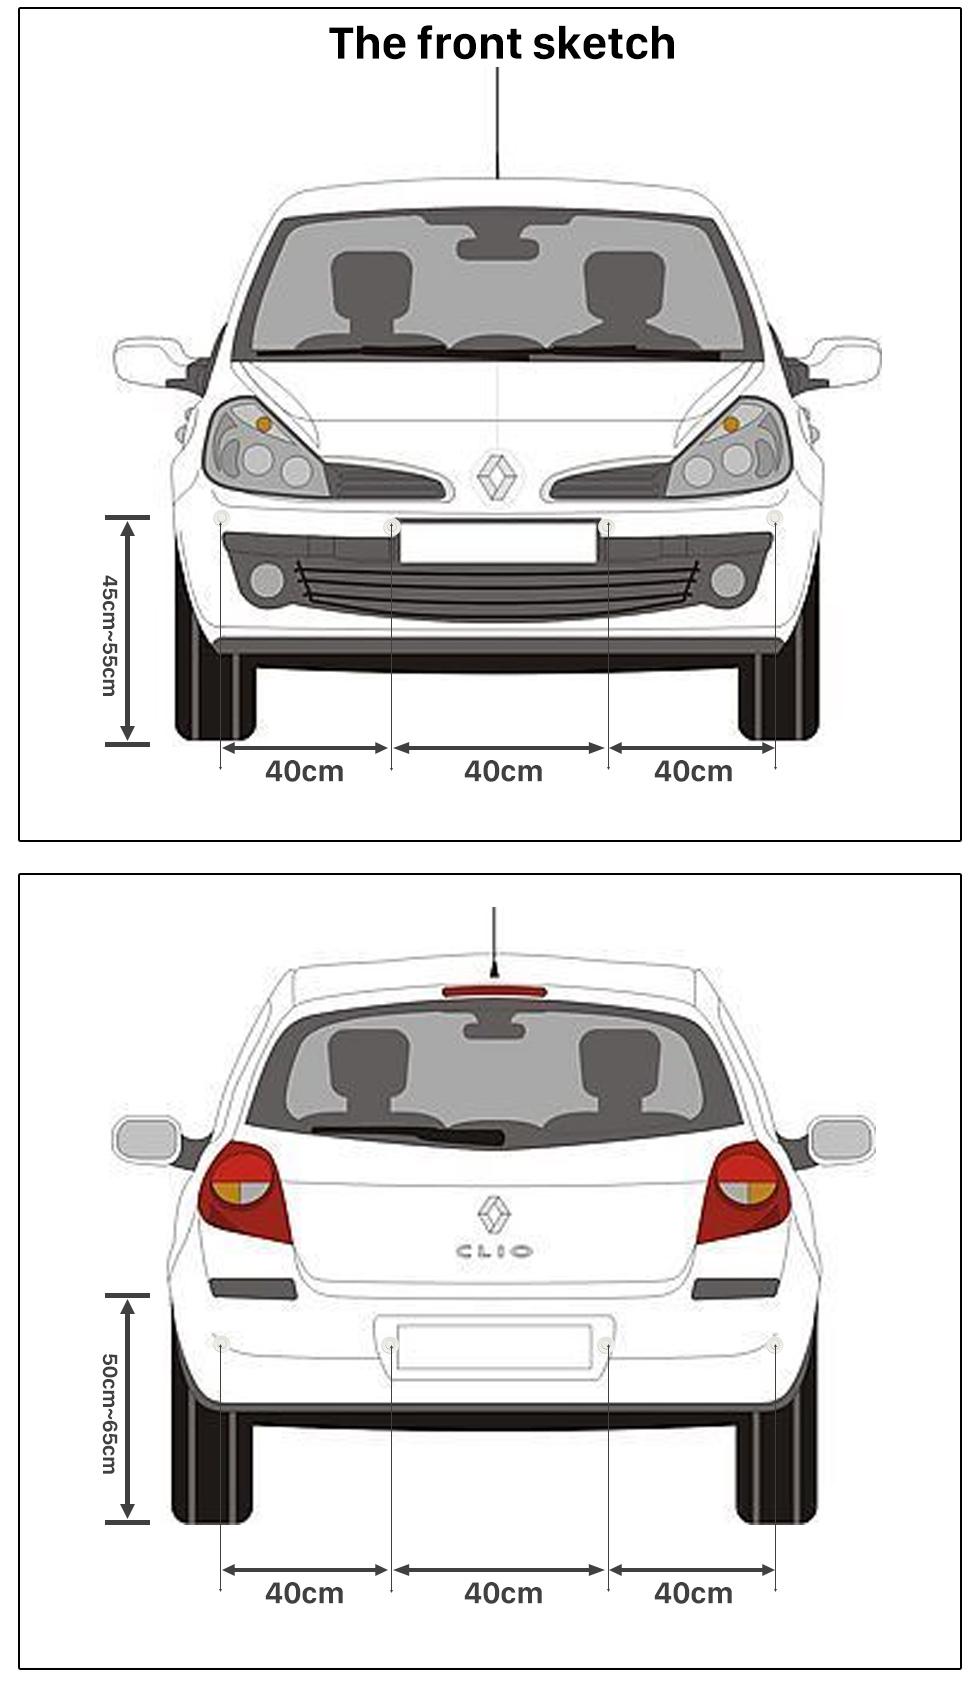 The front sketch Auto Car Universal Parking Assistance System Reverse Sensor with 8 Parking Sensor Visual LED Monitor Reversing Radar